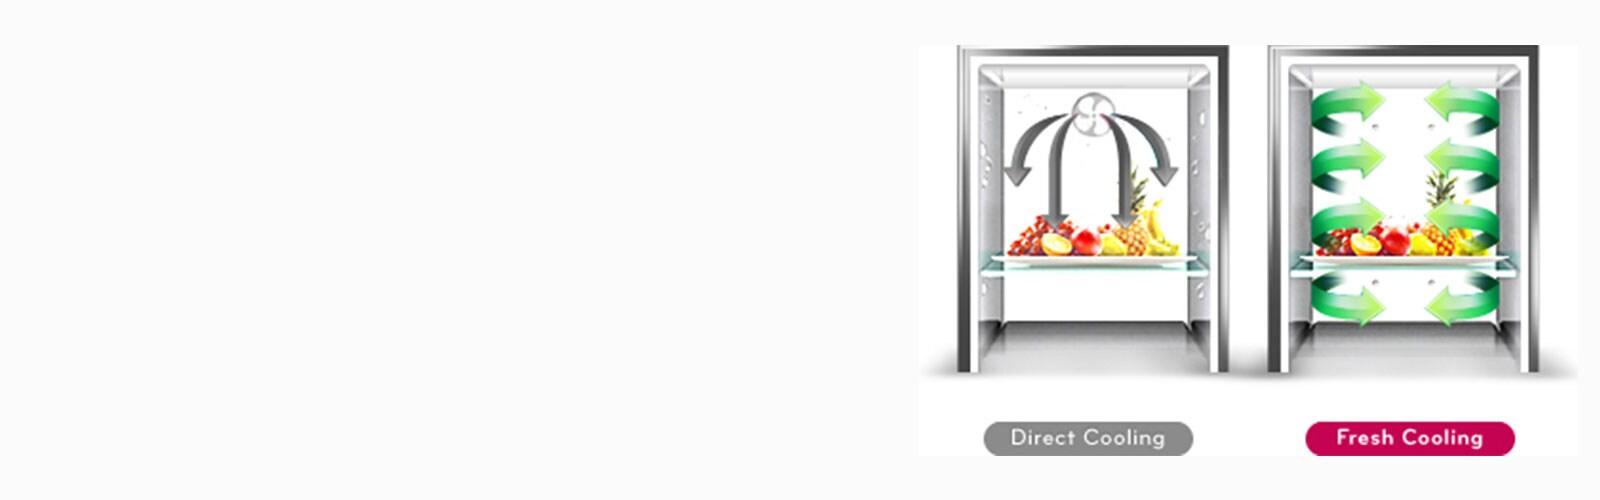 GC-F401ELDZ_lg-refrigerator-lansen-feature_Large_Fresh_Cooling_D_11072019